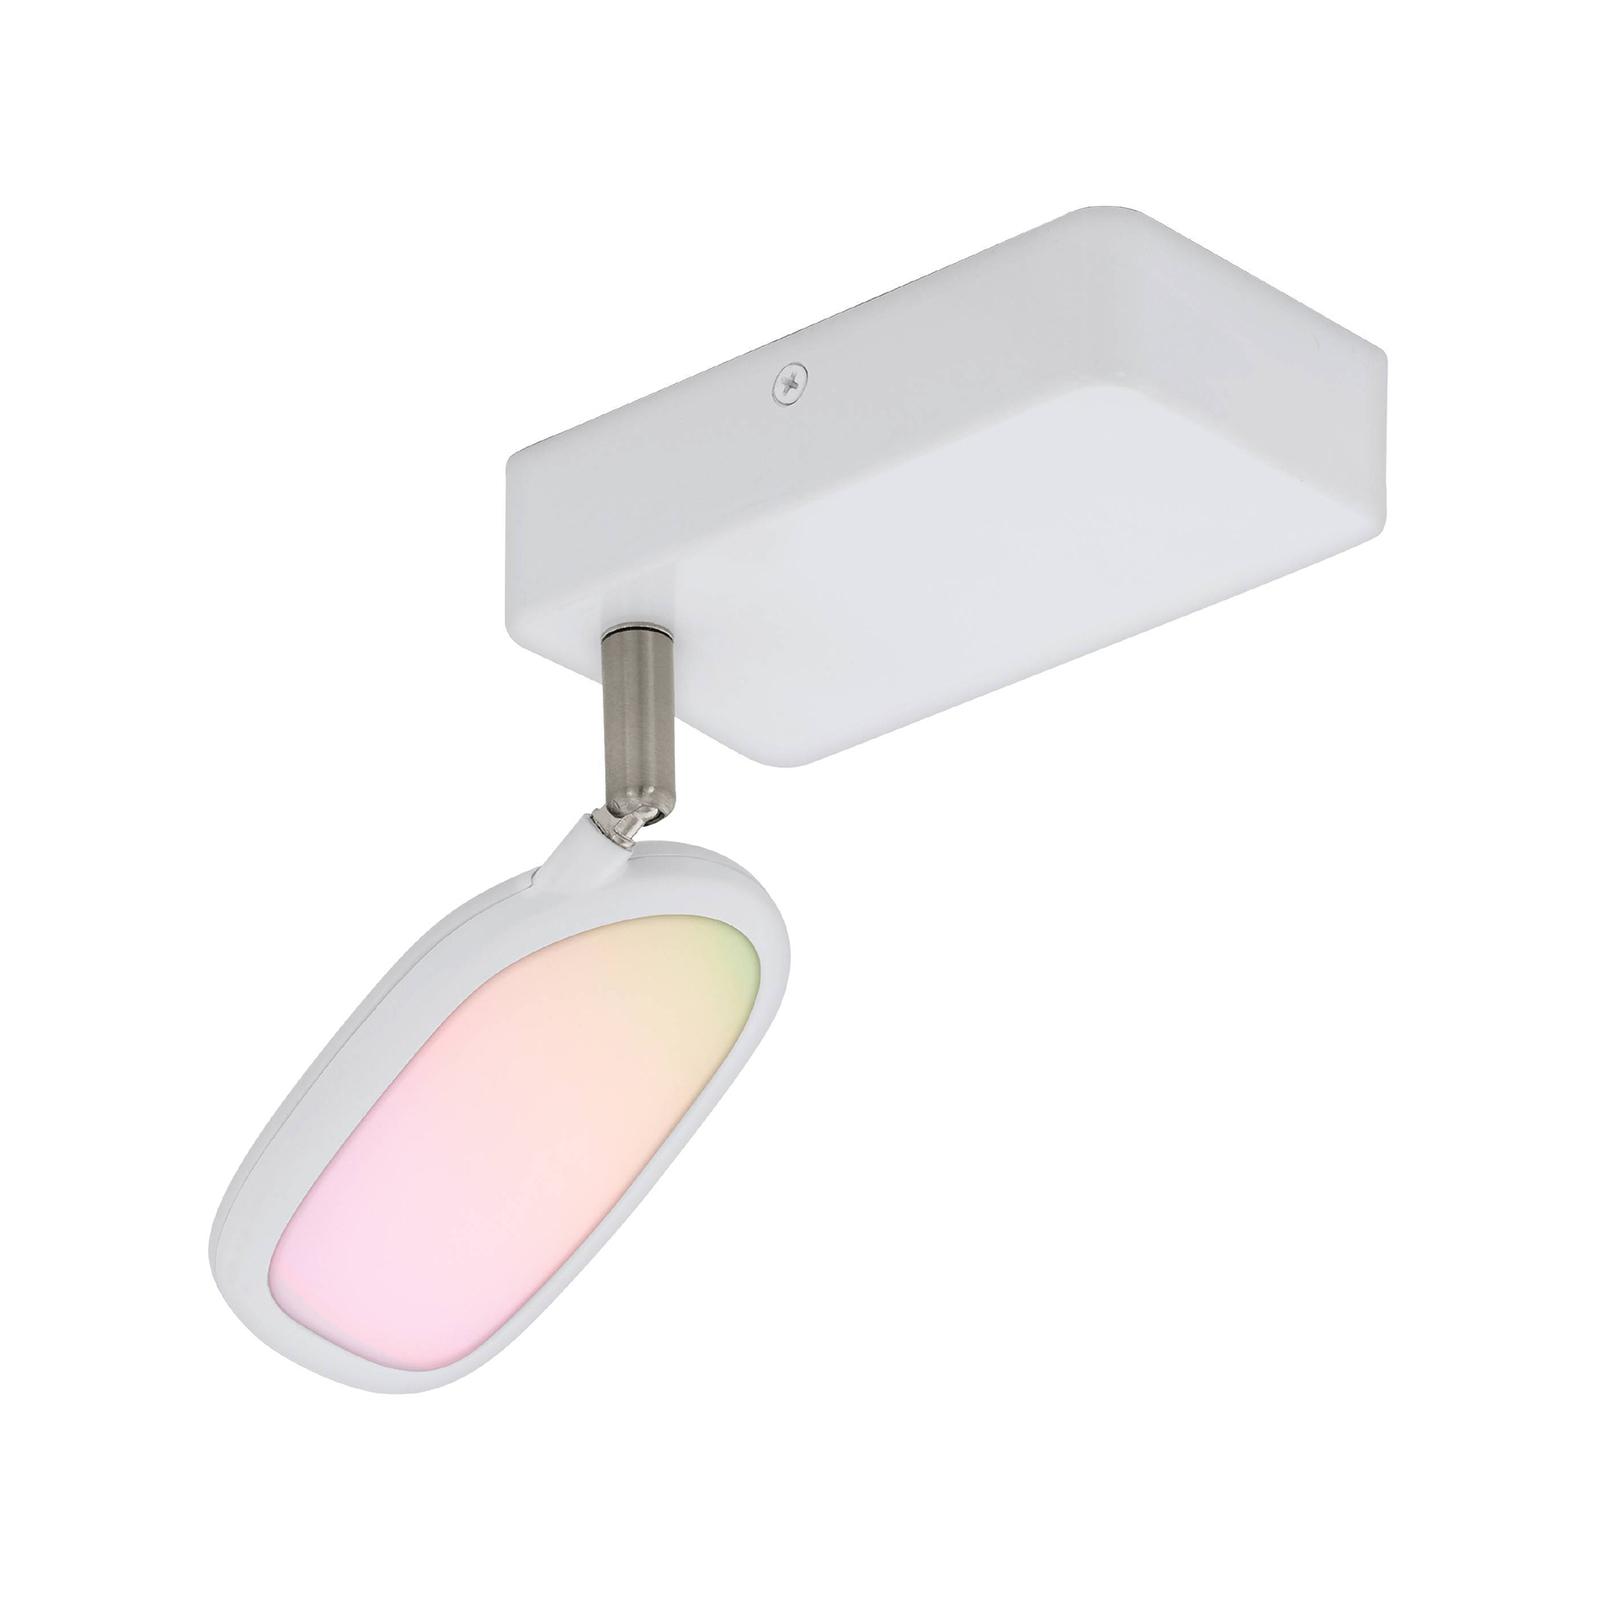 EGLO connect Palombare-C LED-Deckenspot 1flg.